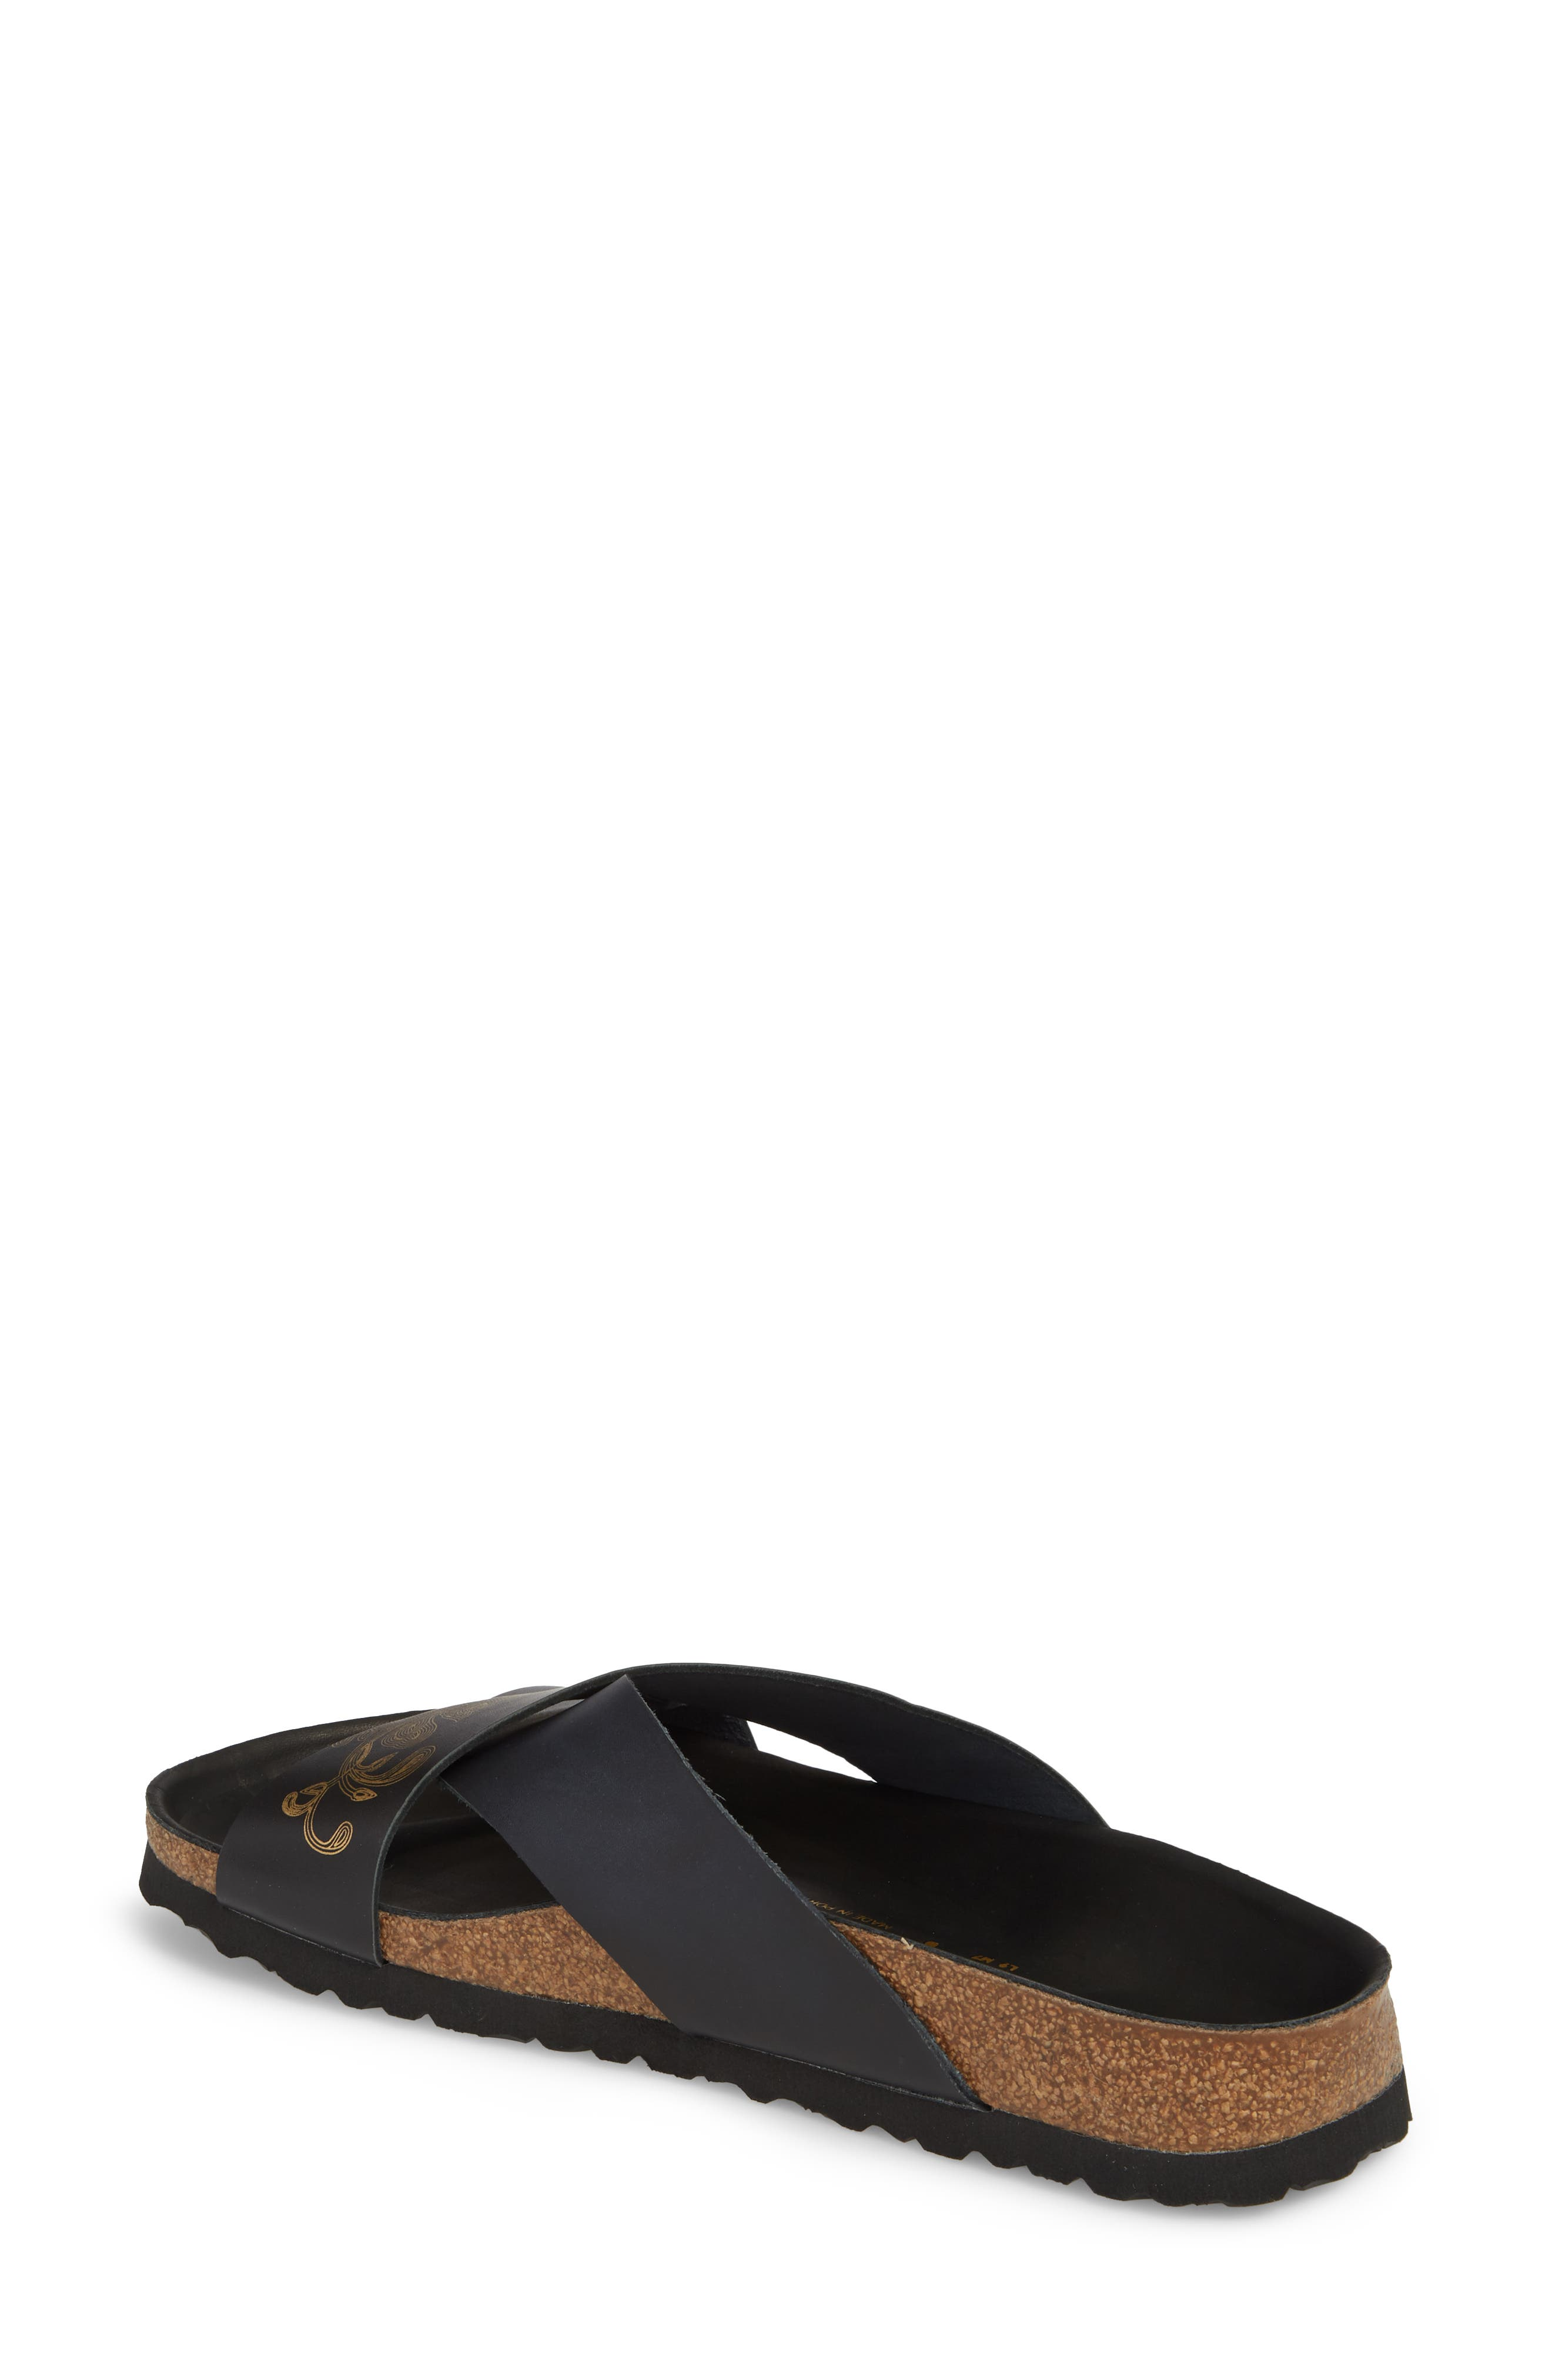 Papillio by Birkenstock Daytona Hex Slide Sandal,                             Alternate thumbnail 2, color,                             Ornaments Black Leather